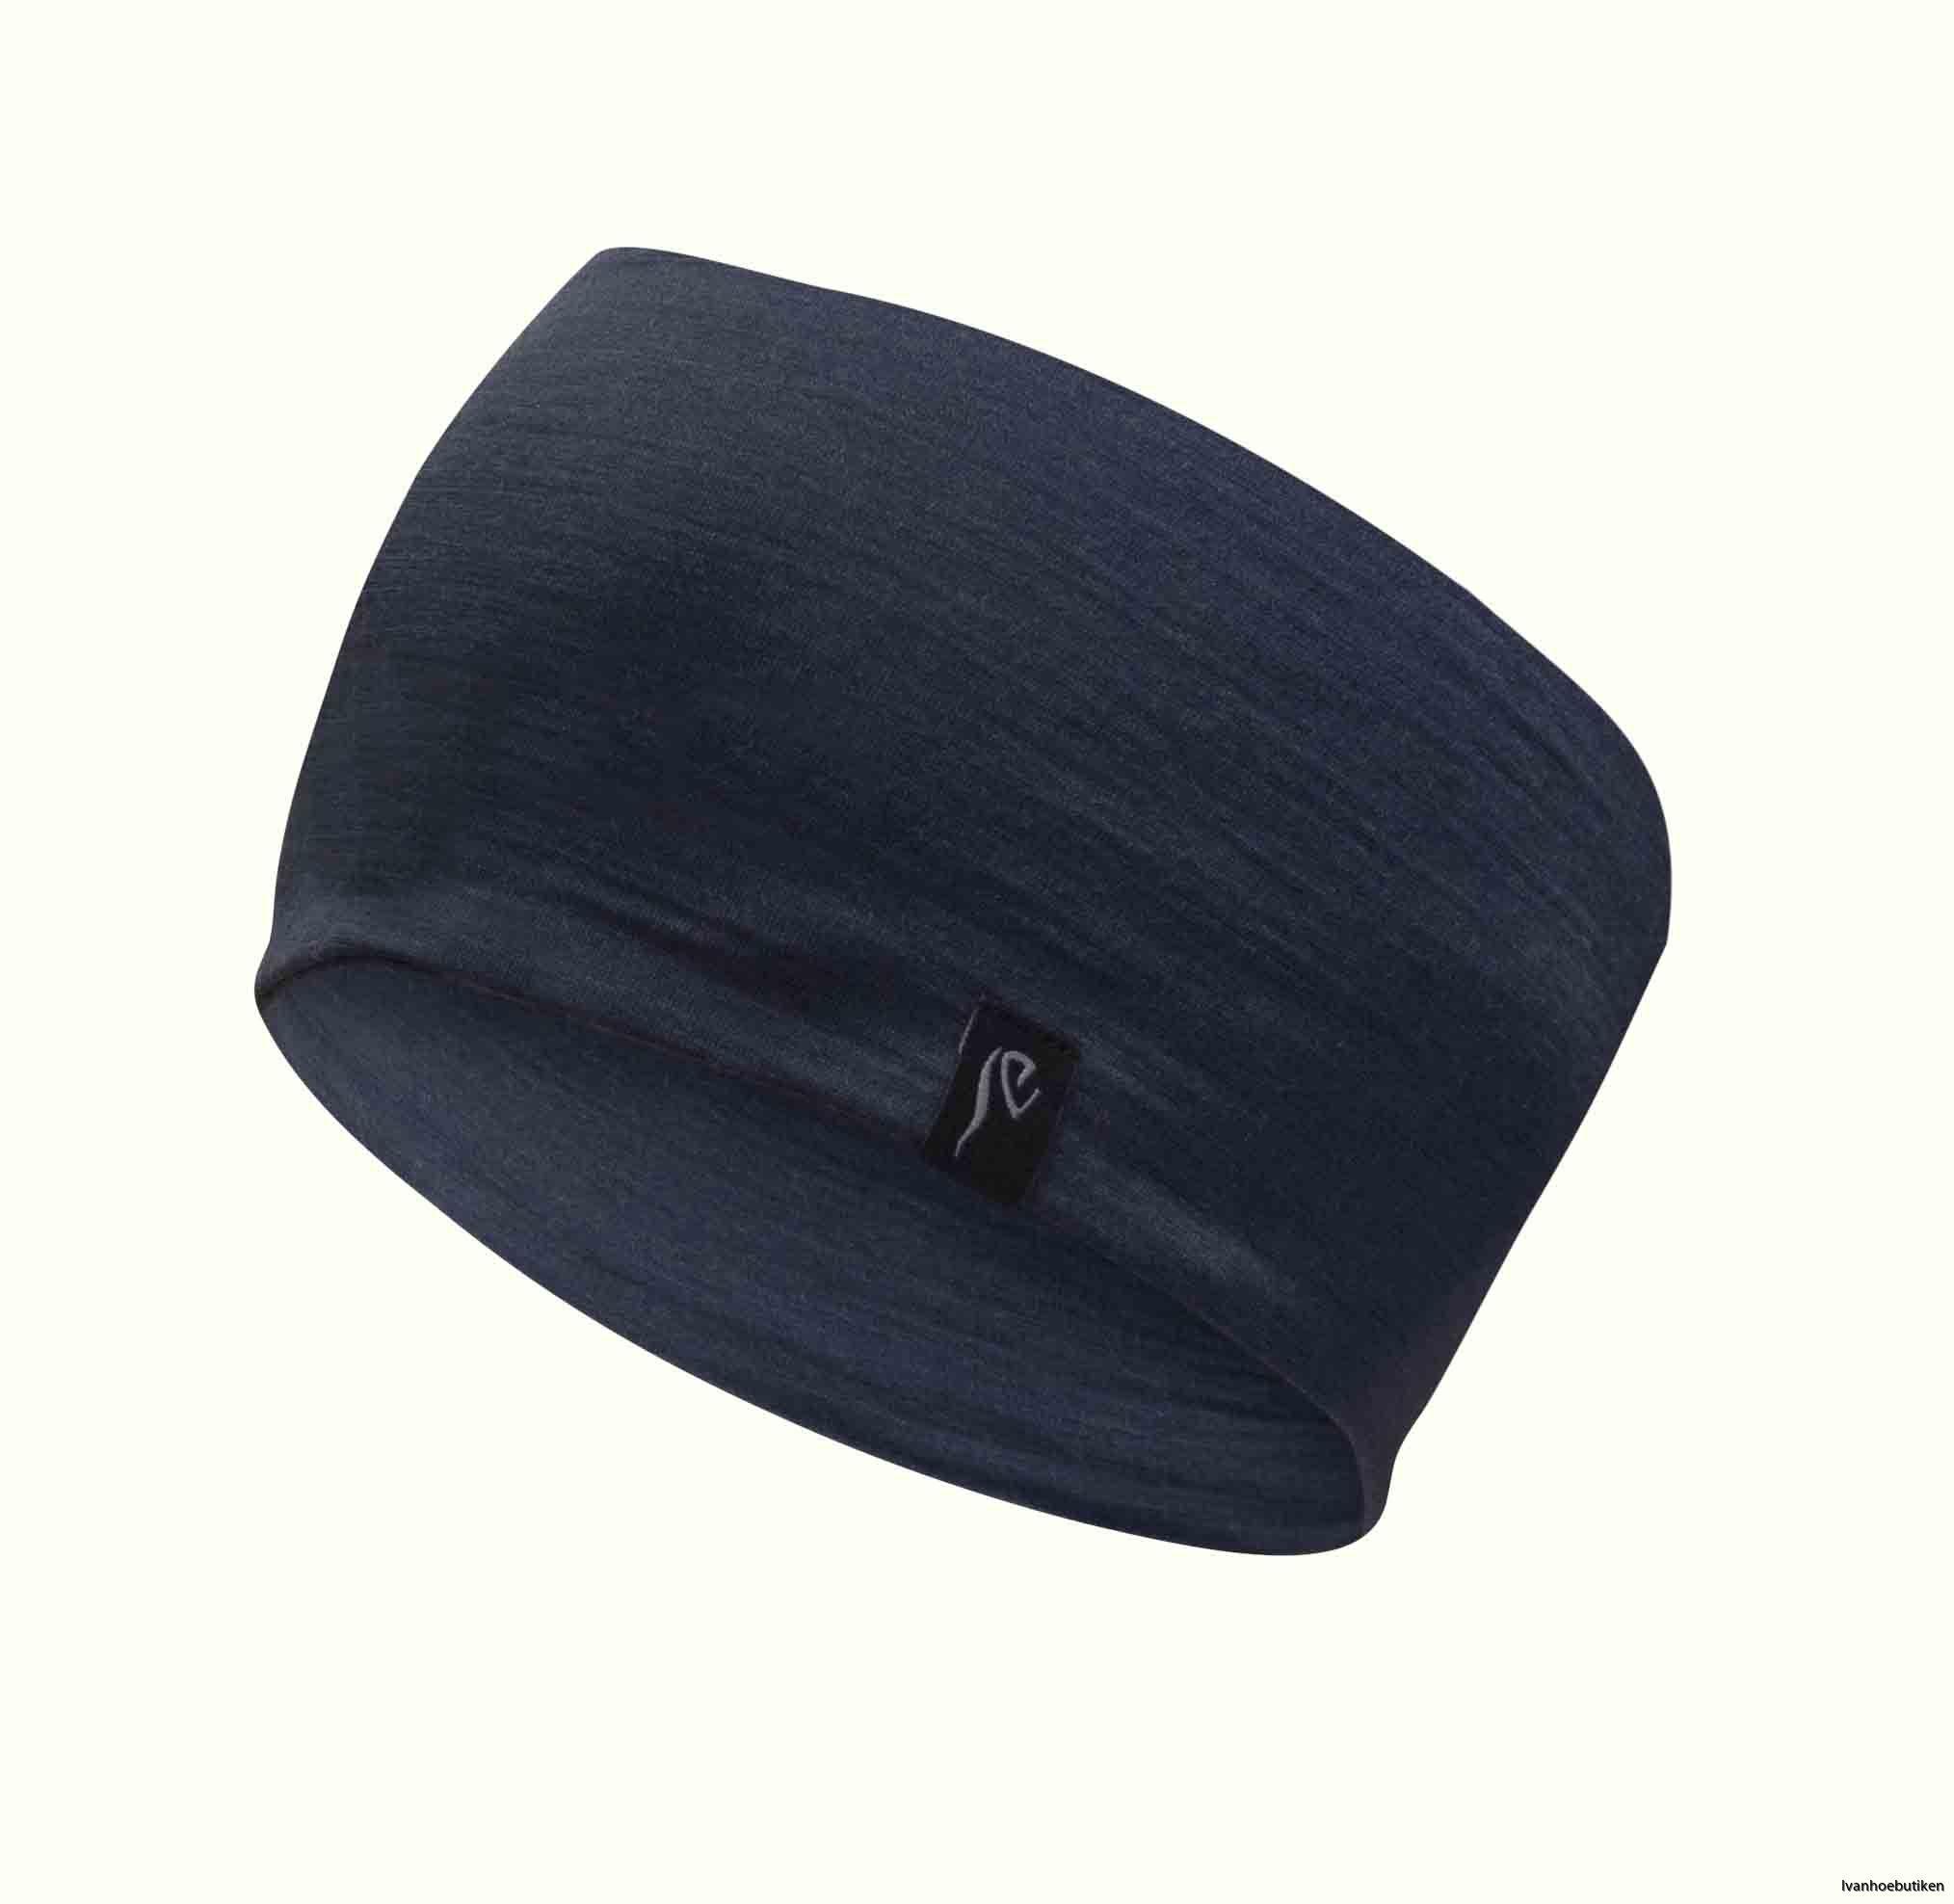 UW_headband_617_low